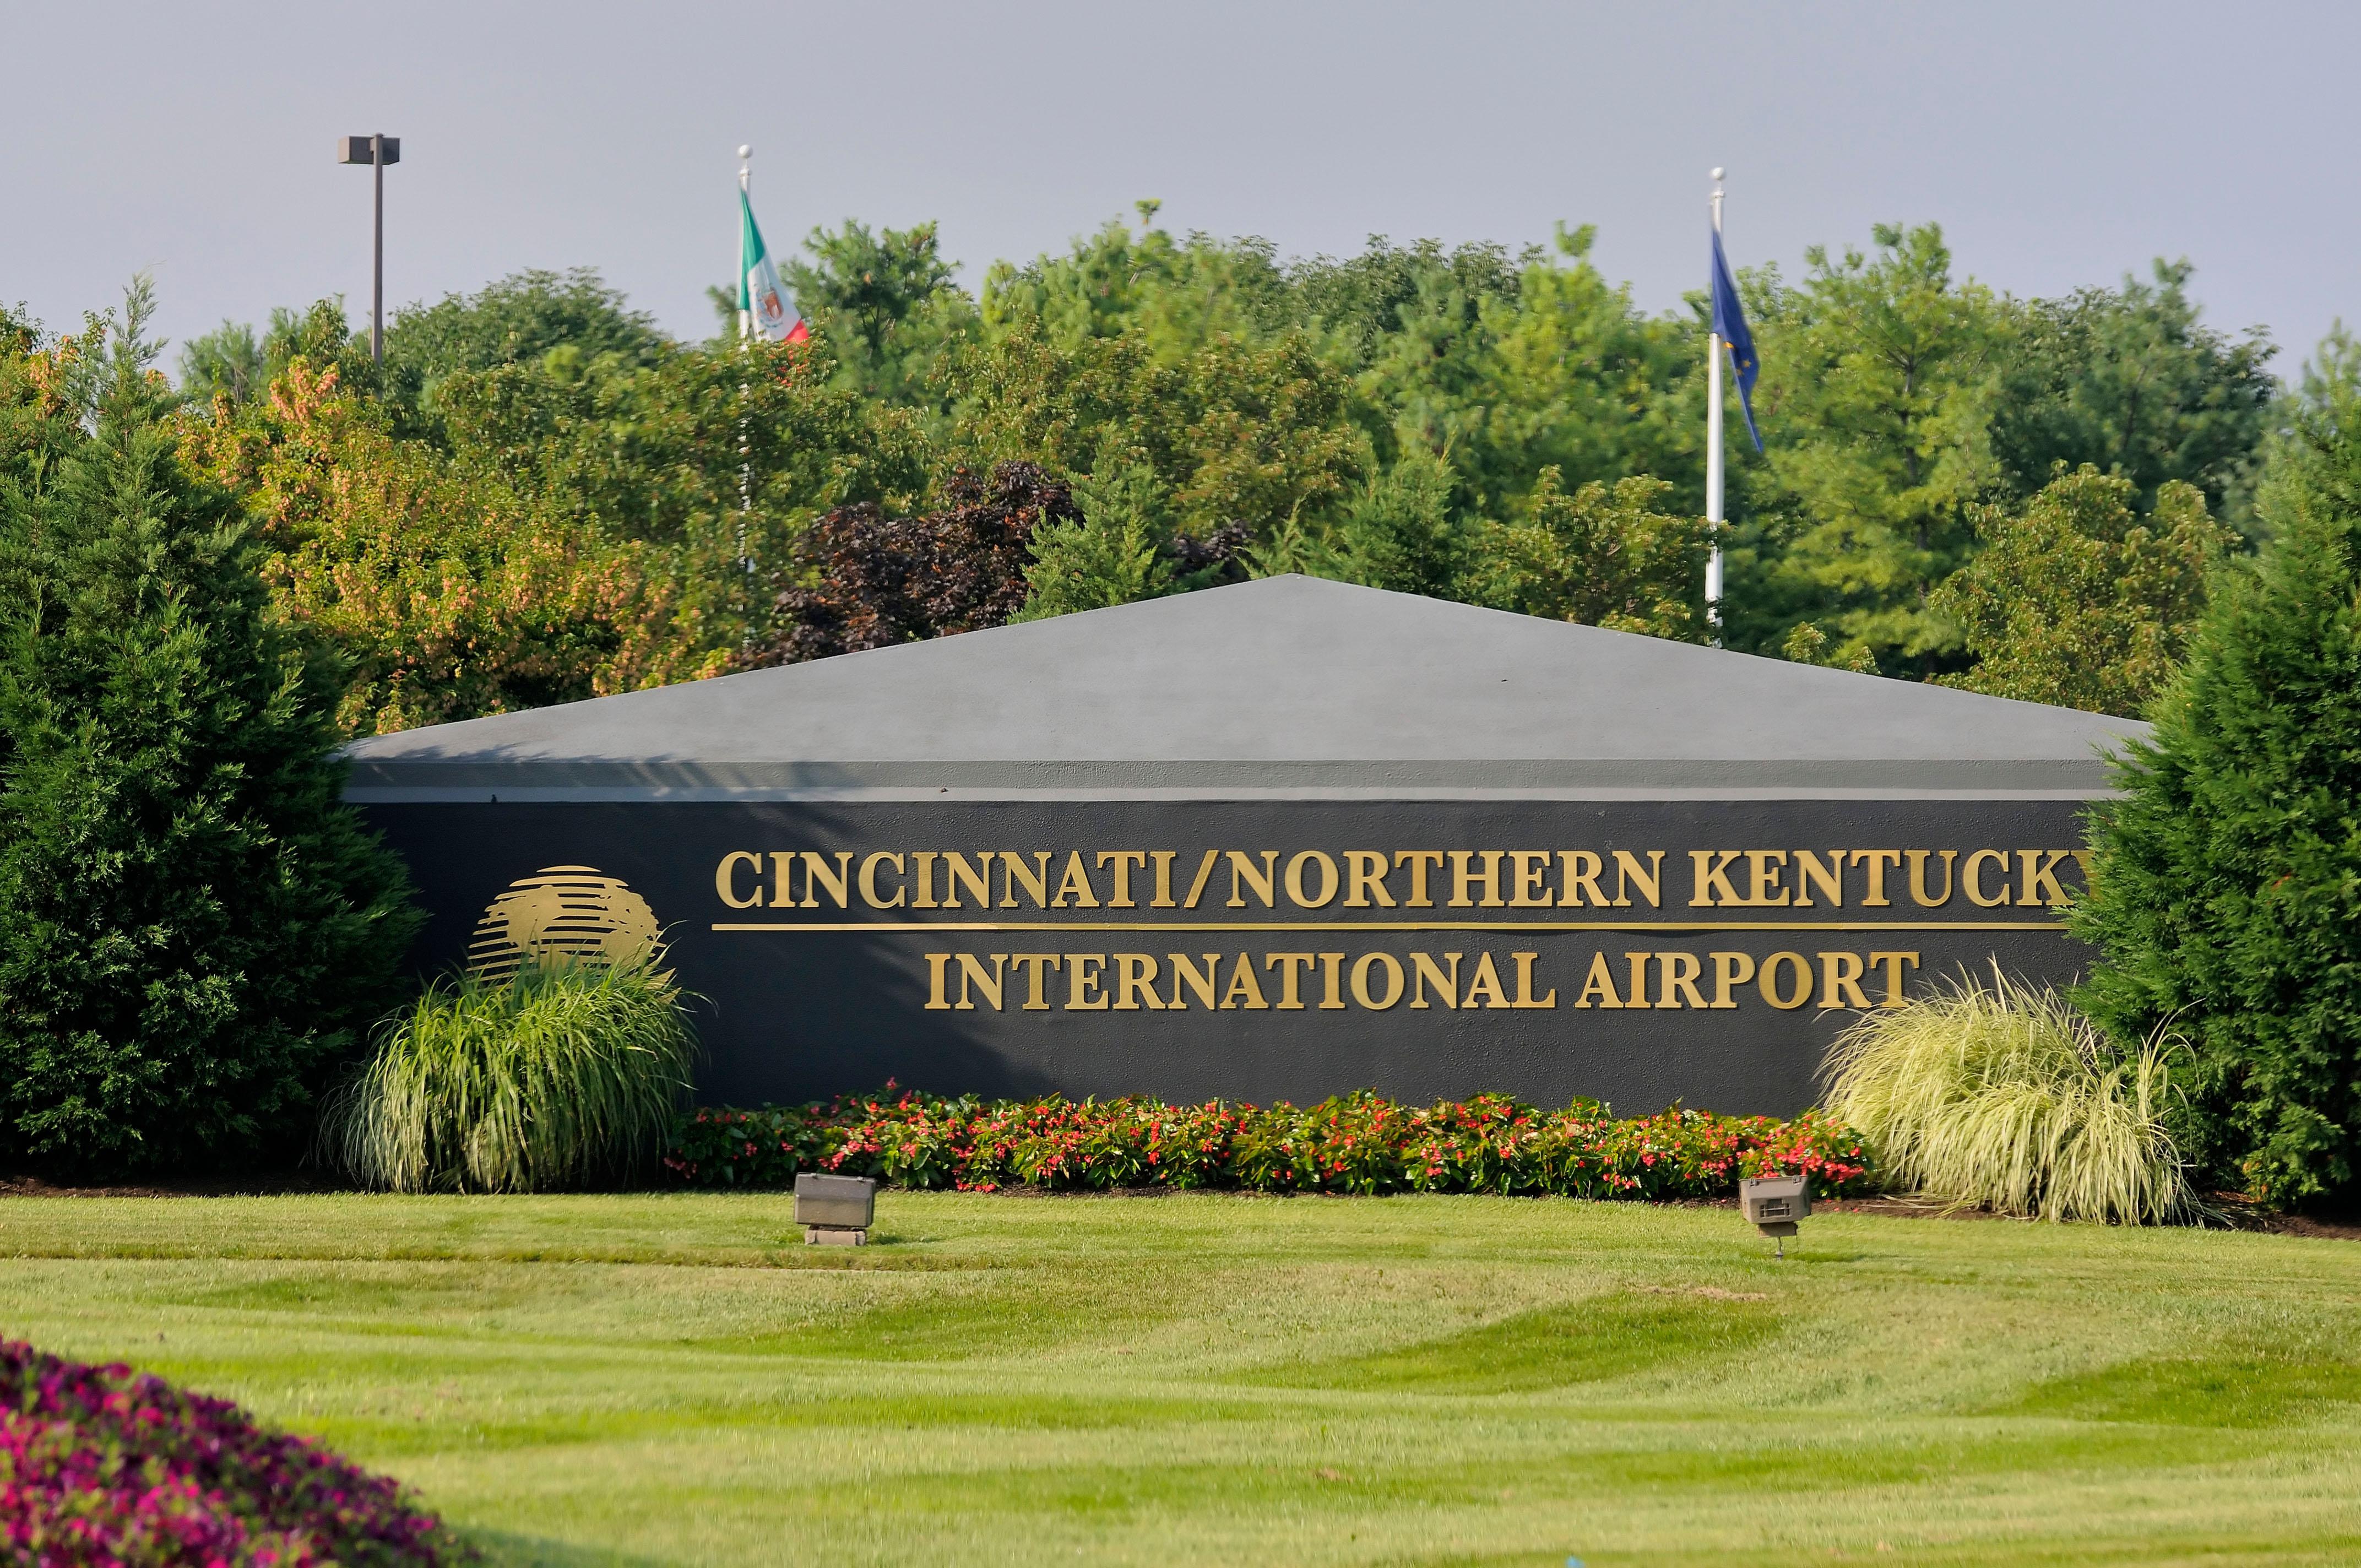 Entrance sign for the Cincinnati/Northern Kentucky International Airport